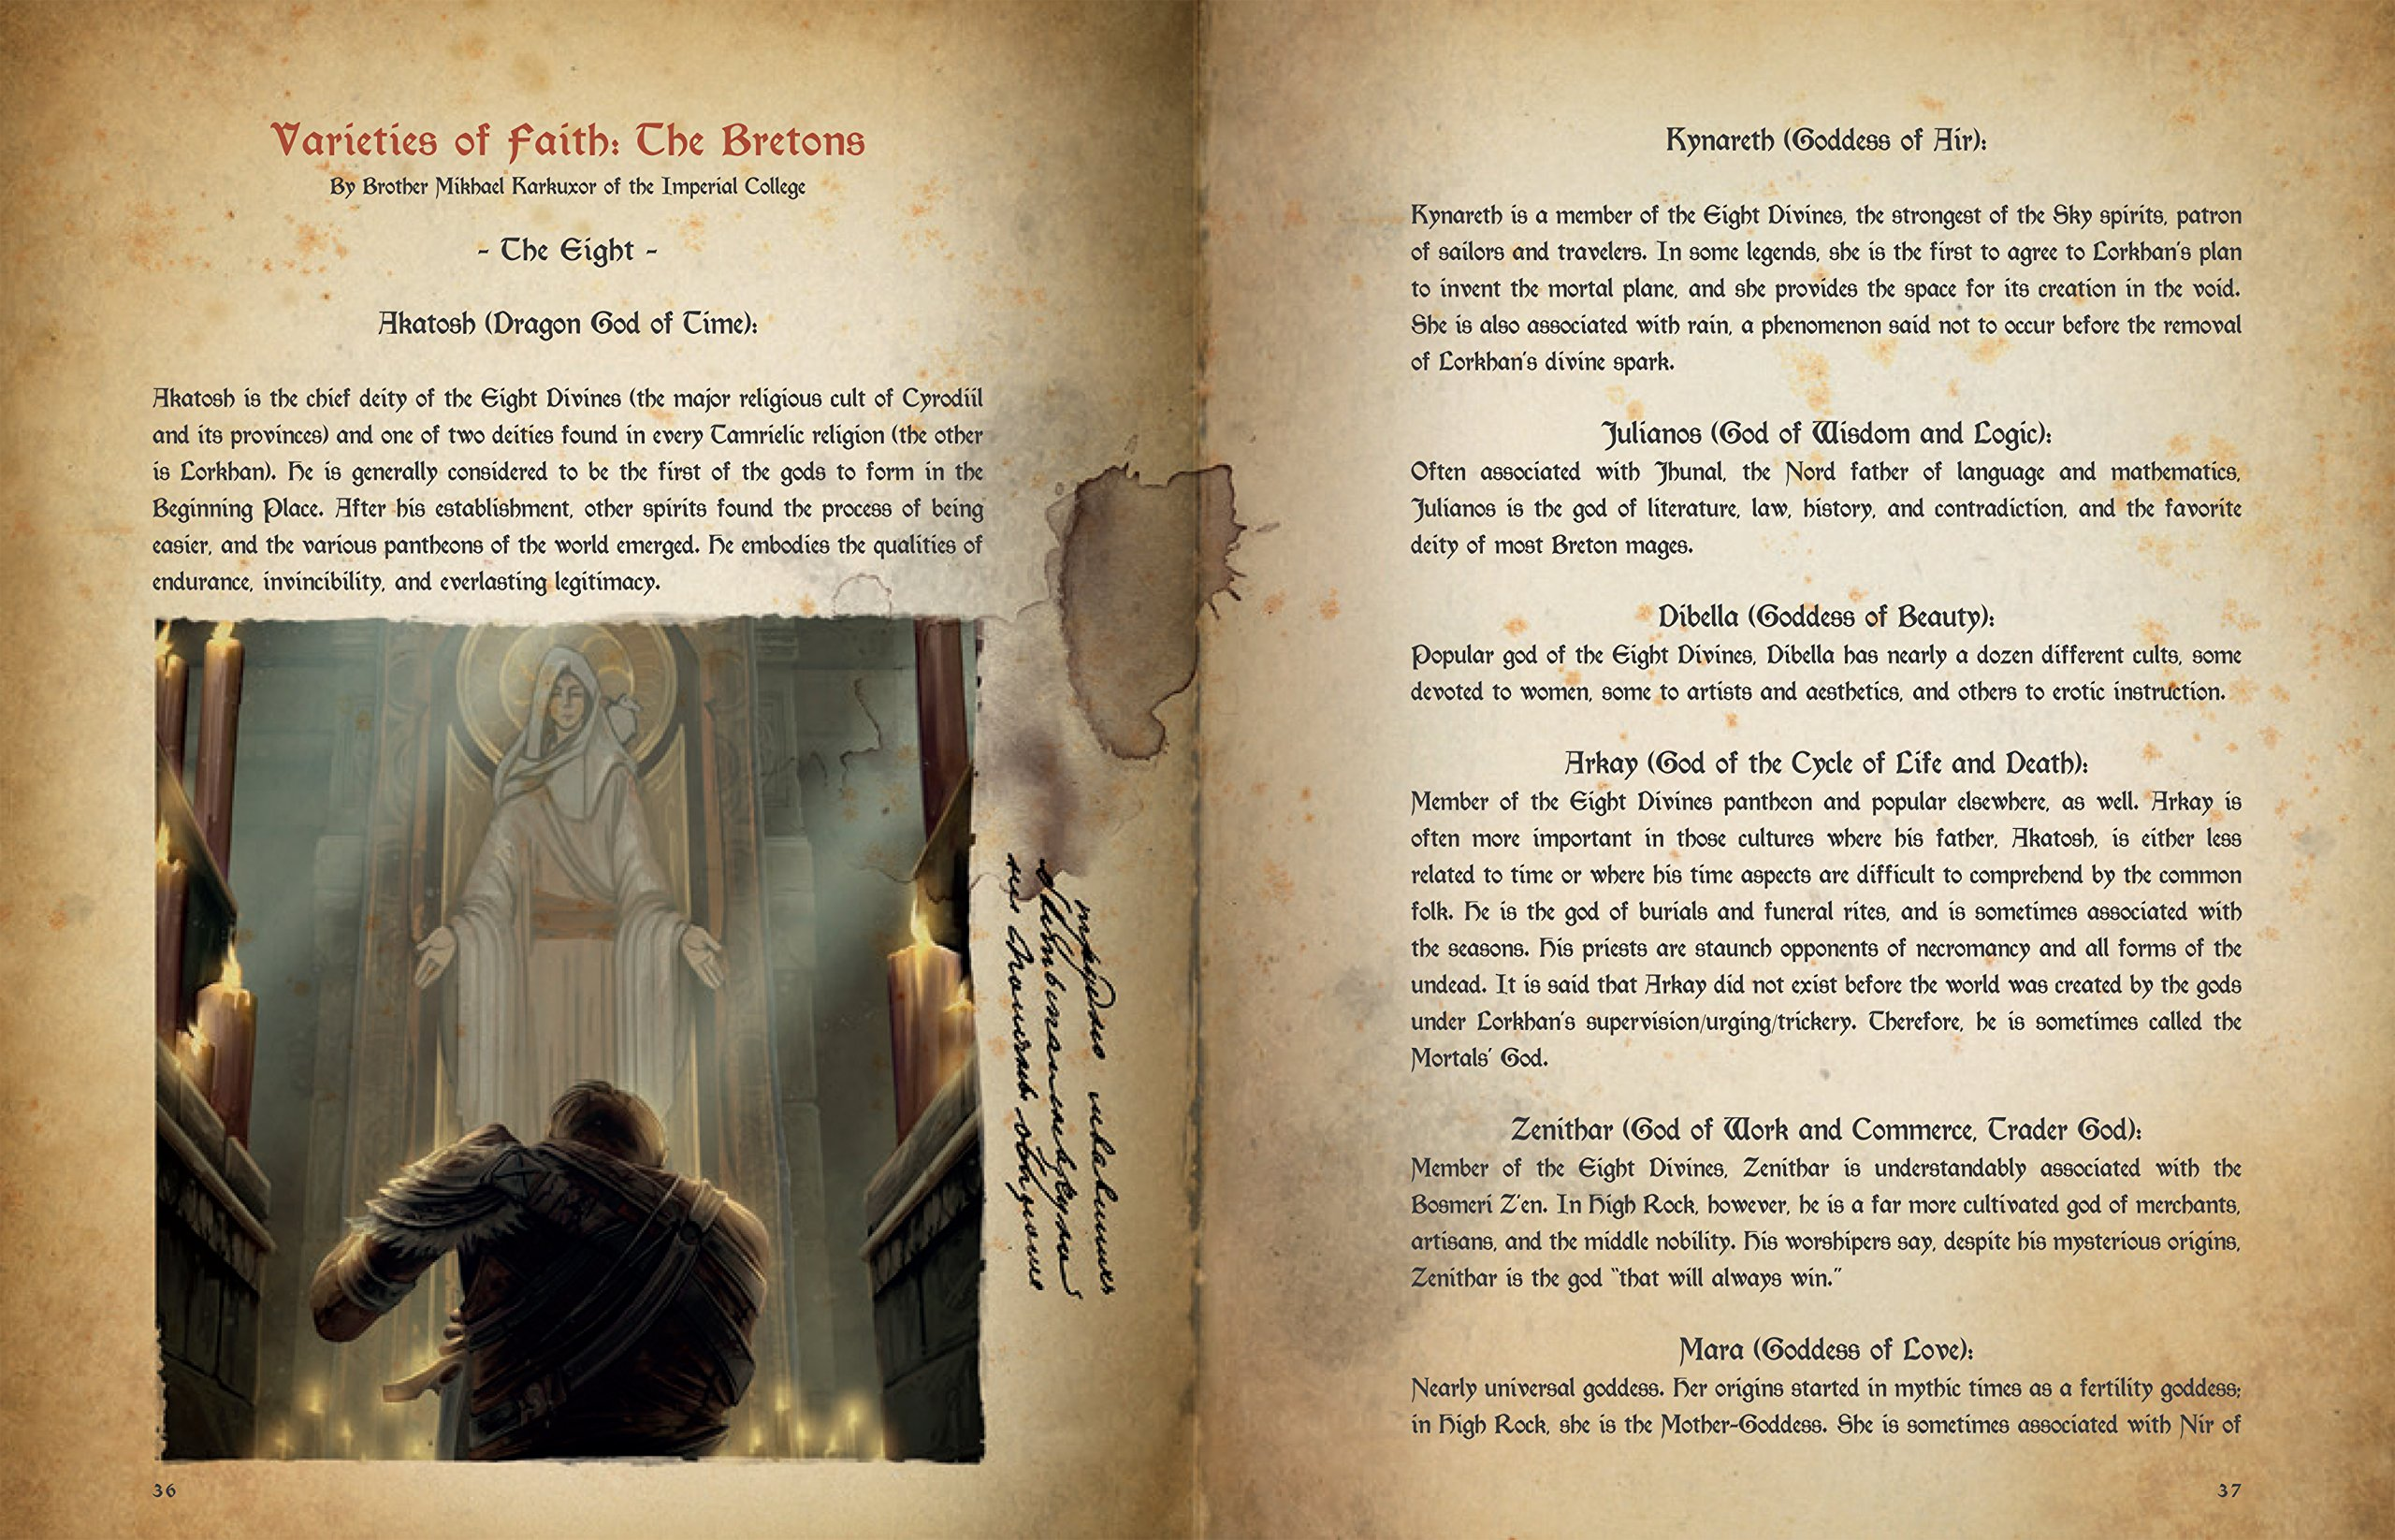 Amazoncom The Elder Scrolls Online Tales of Tamriel Book I 2560x1646